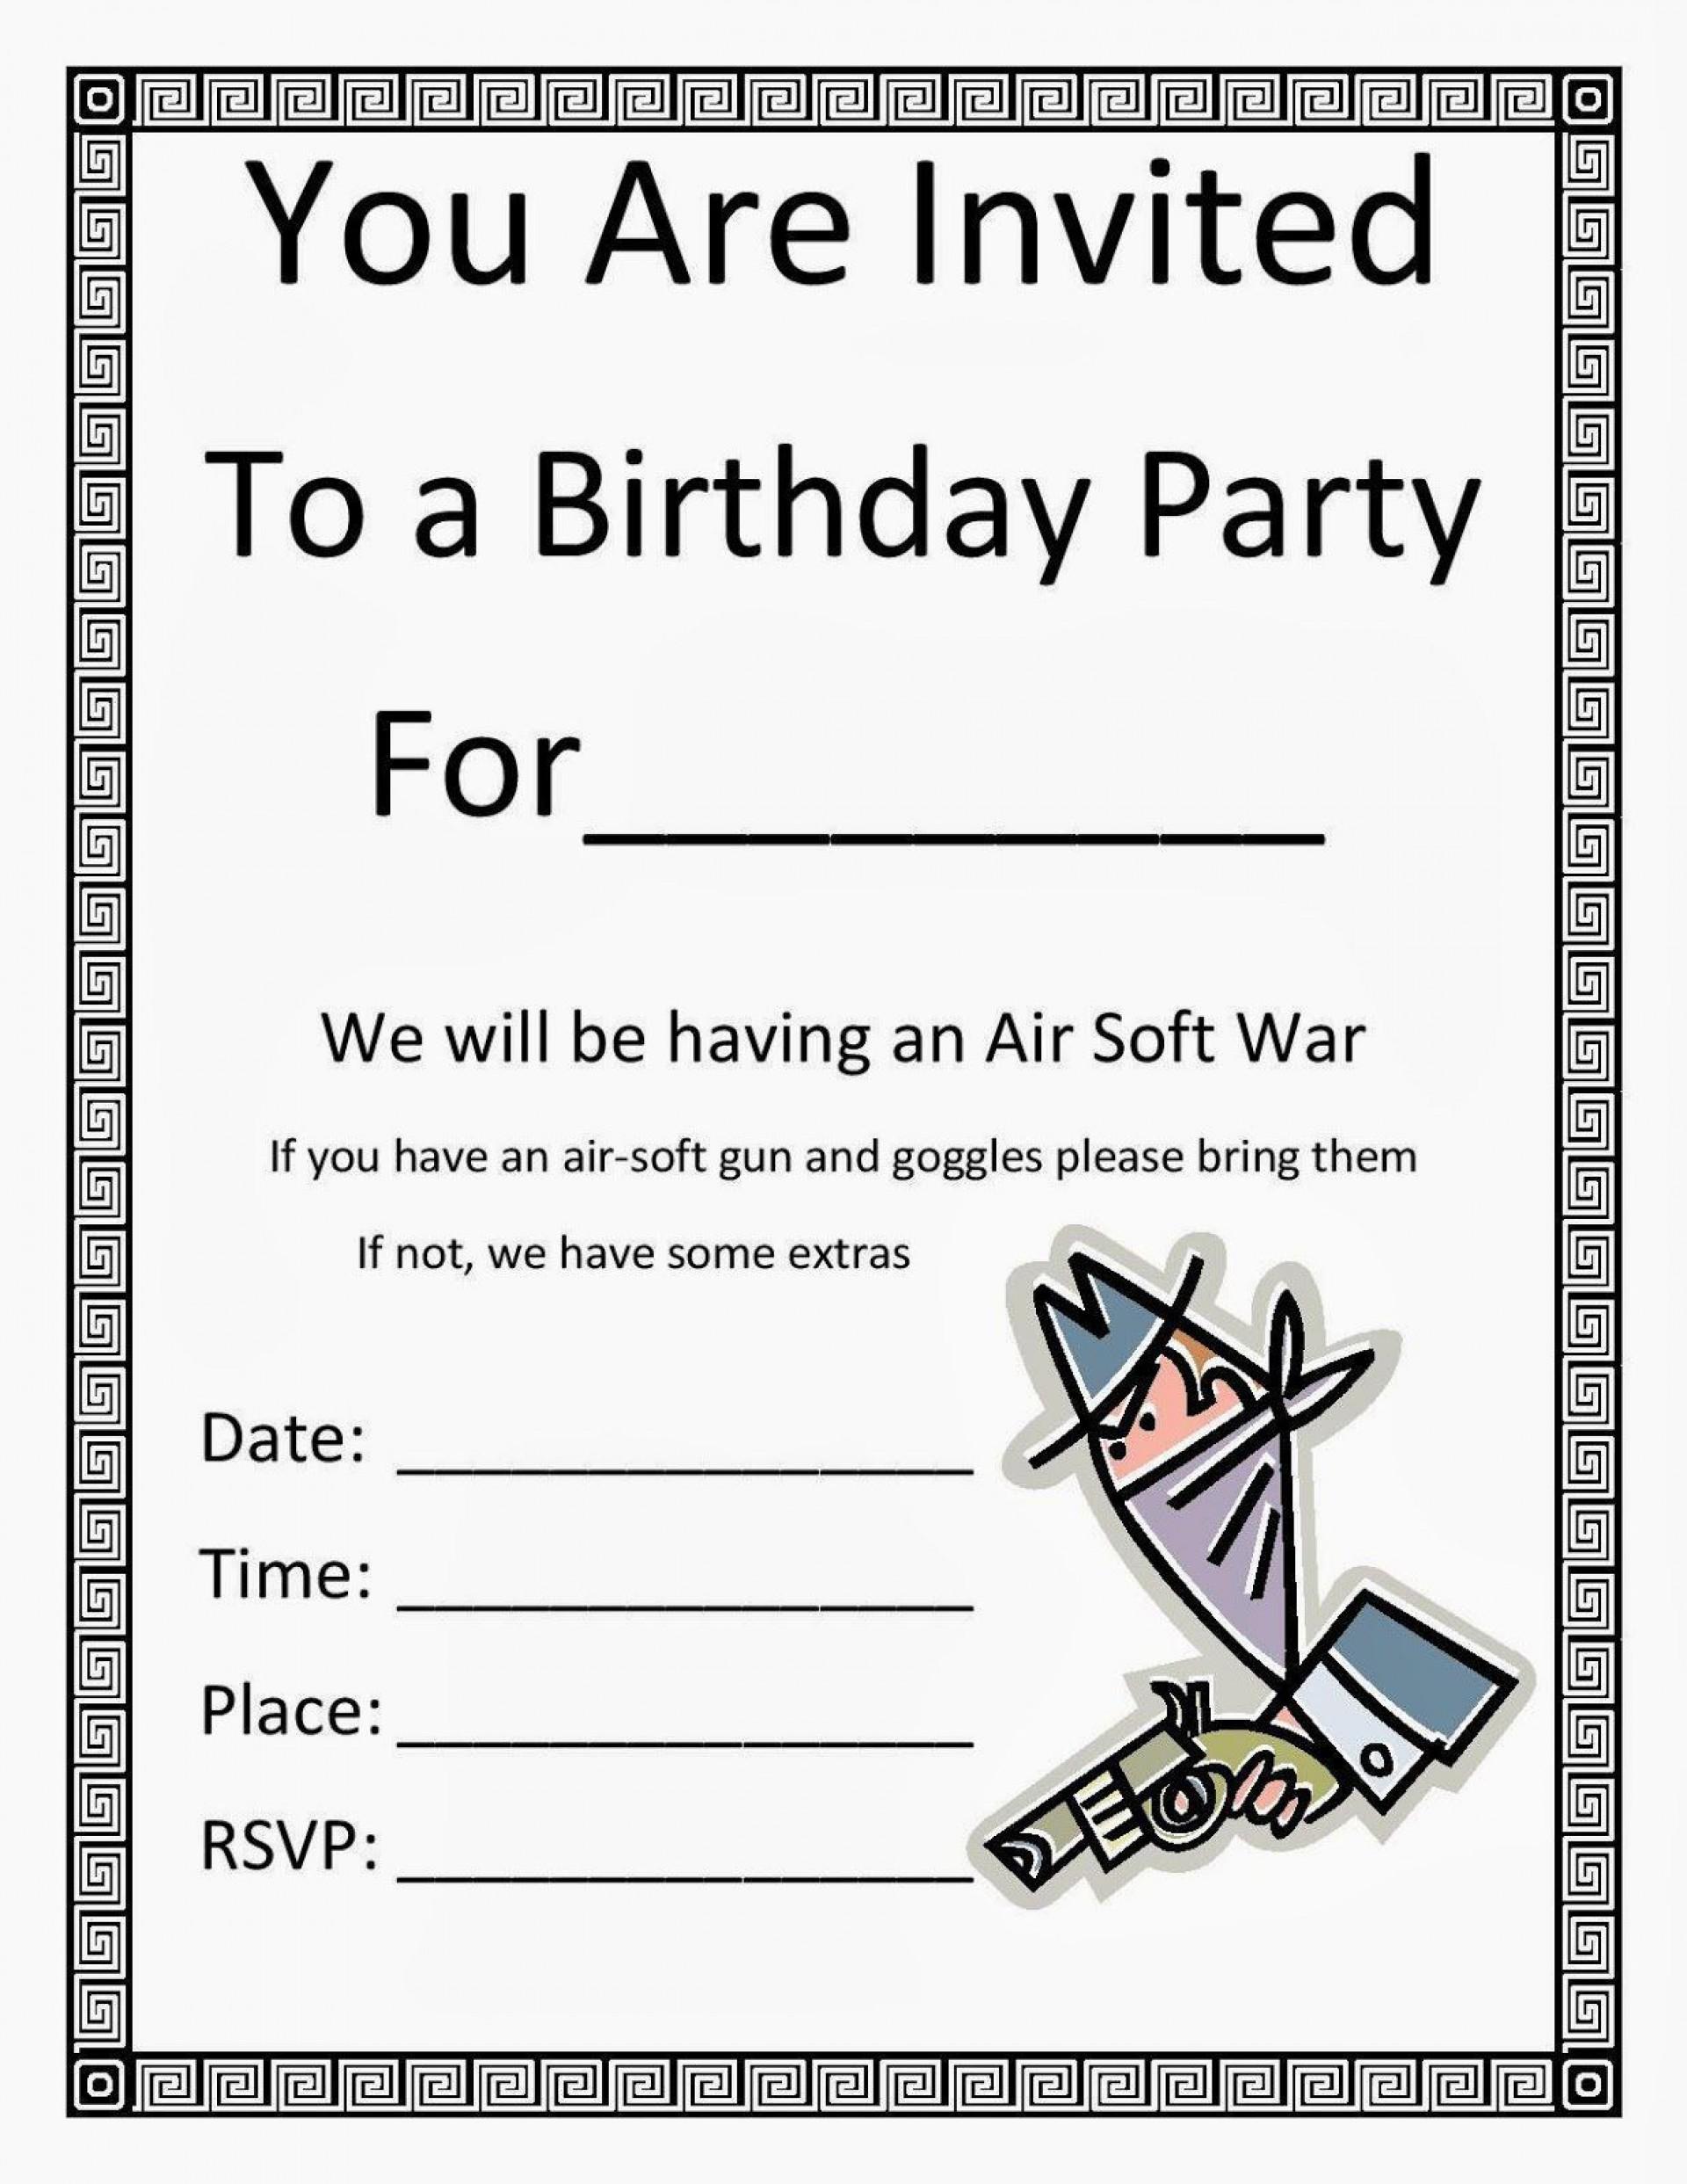 000 Marvelou Microsoft Word Birthday Invitation Template Sample  Editable 50th 60th1920